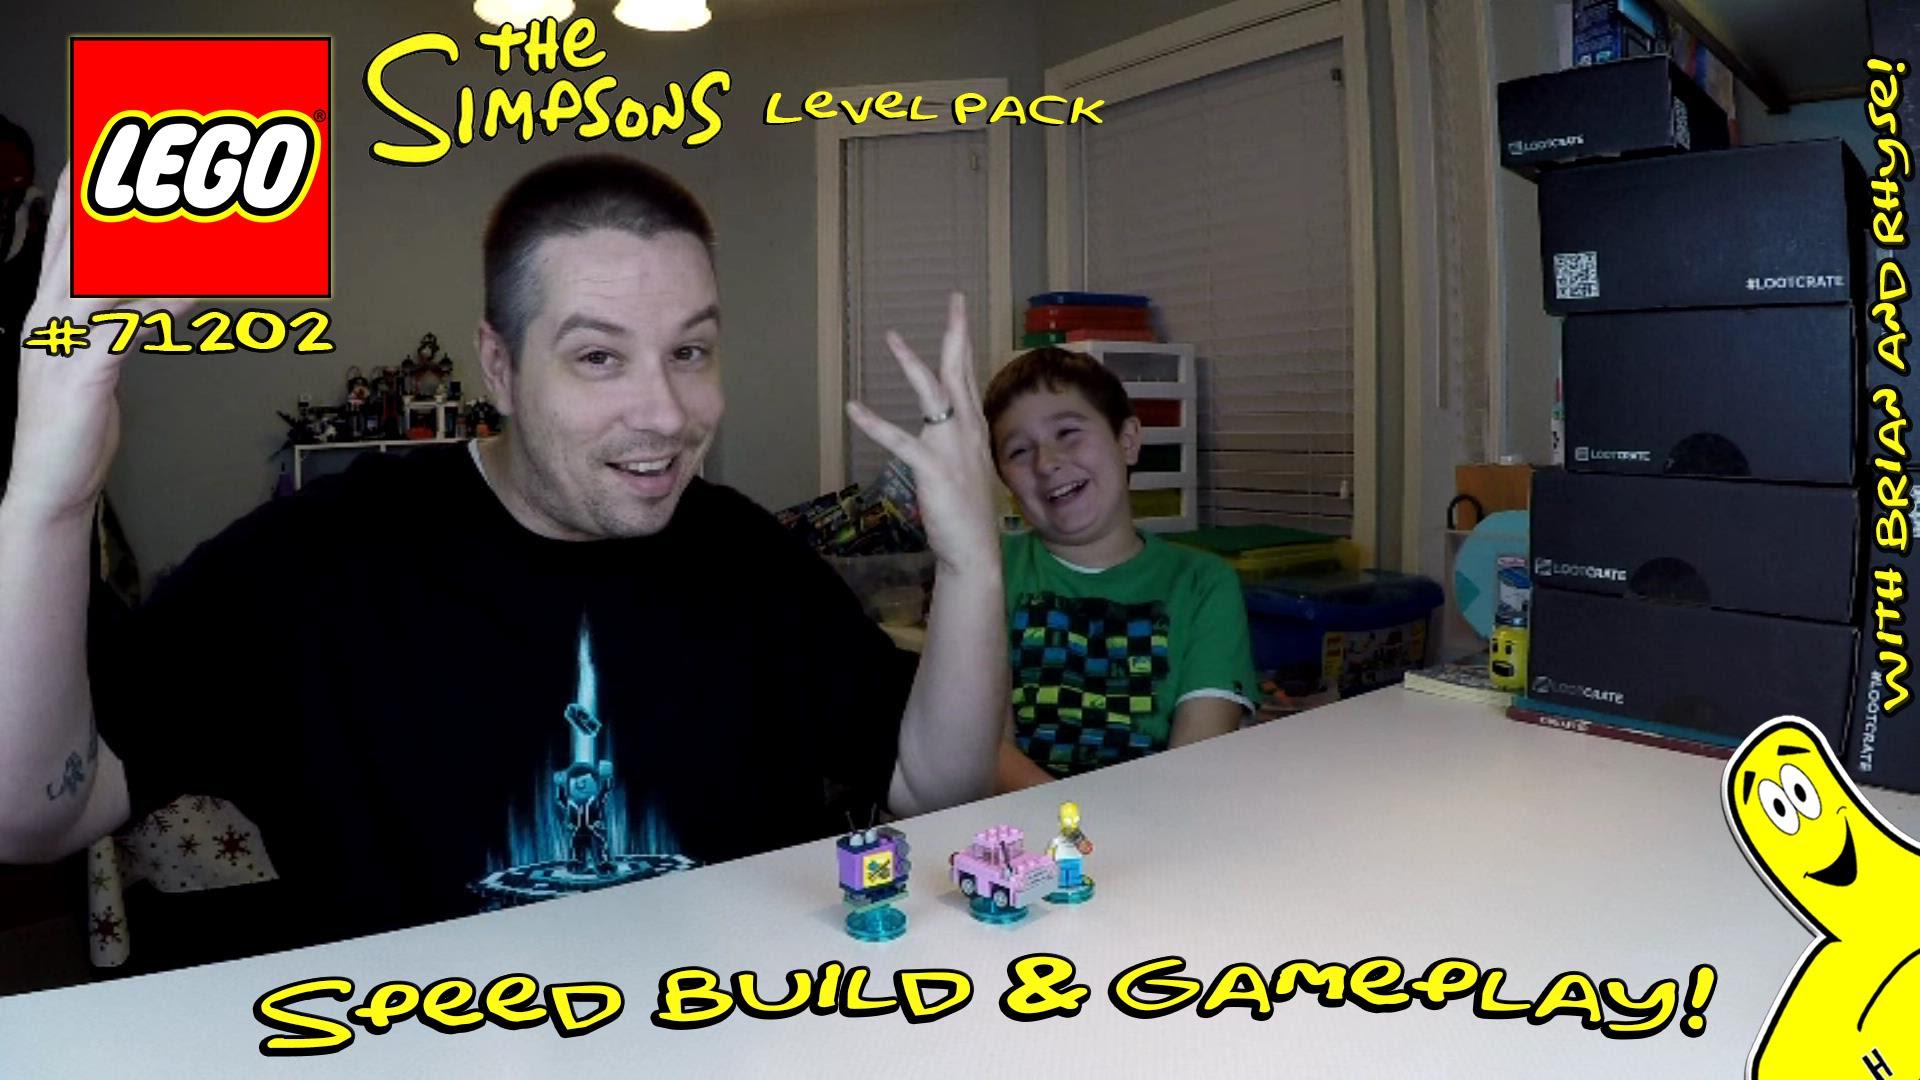 Lego Dimensions: #71202 Simpsons LEVEL Pack Unboxing/SpeedBuild/Gameplay – HTG